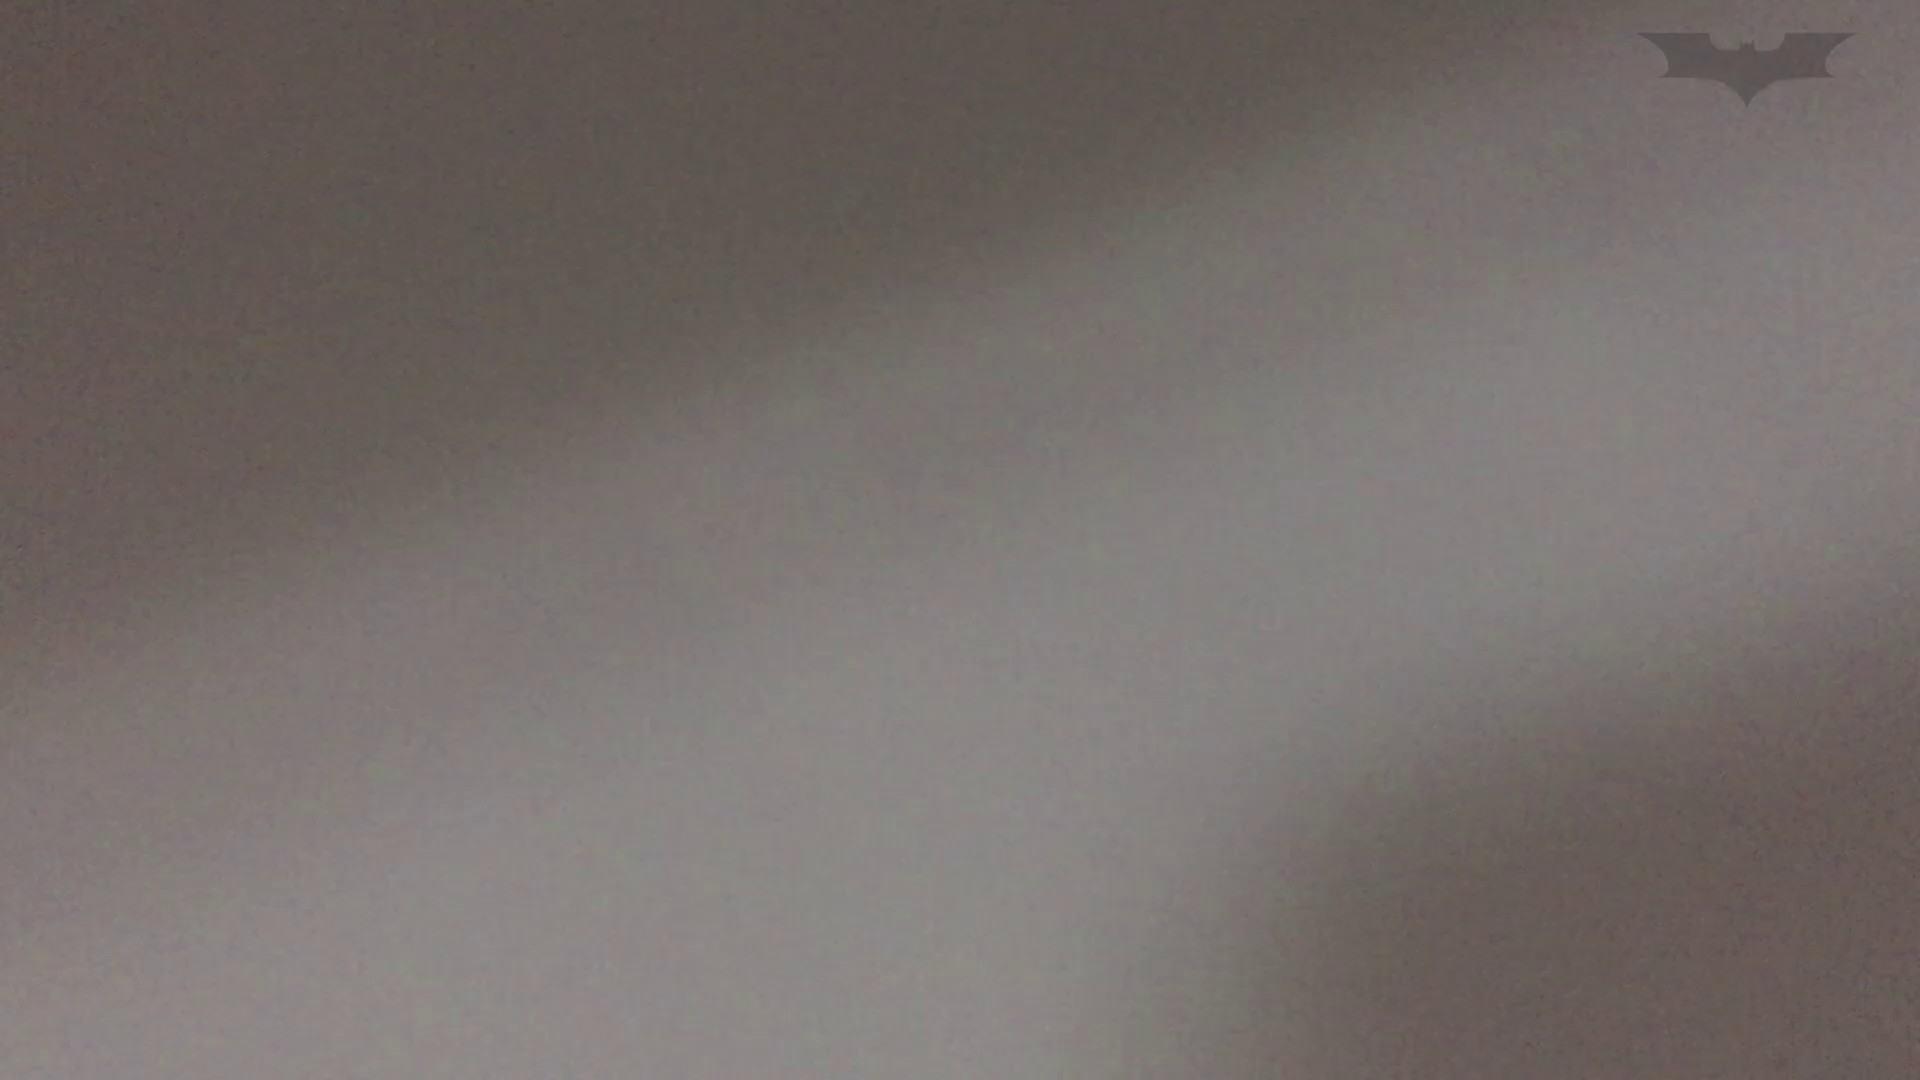 JD盗撮 美女の洗面所の秘密 Vol.67 丸見え セックス無修正動画無料 55画像 43